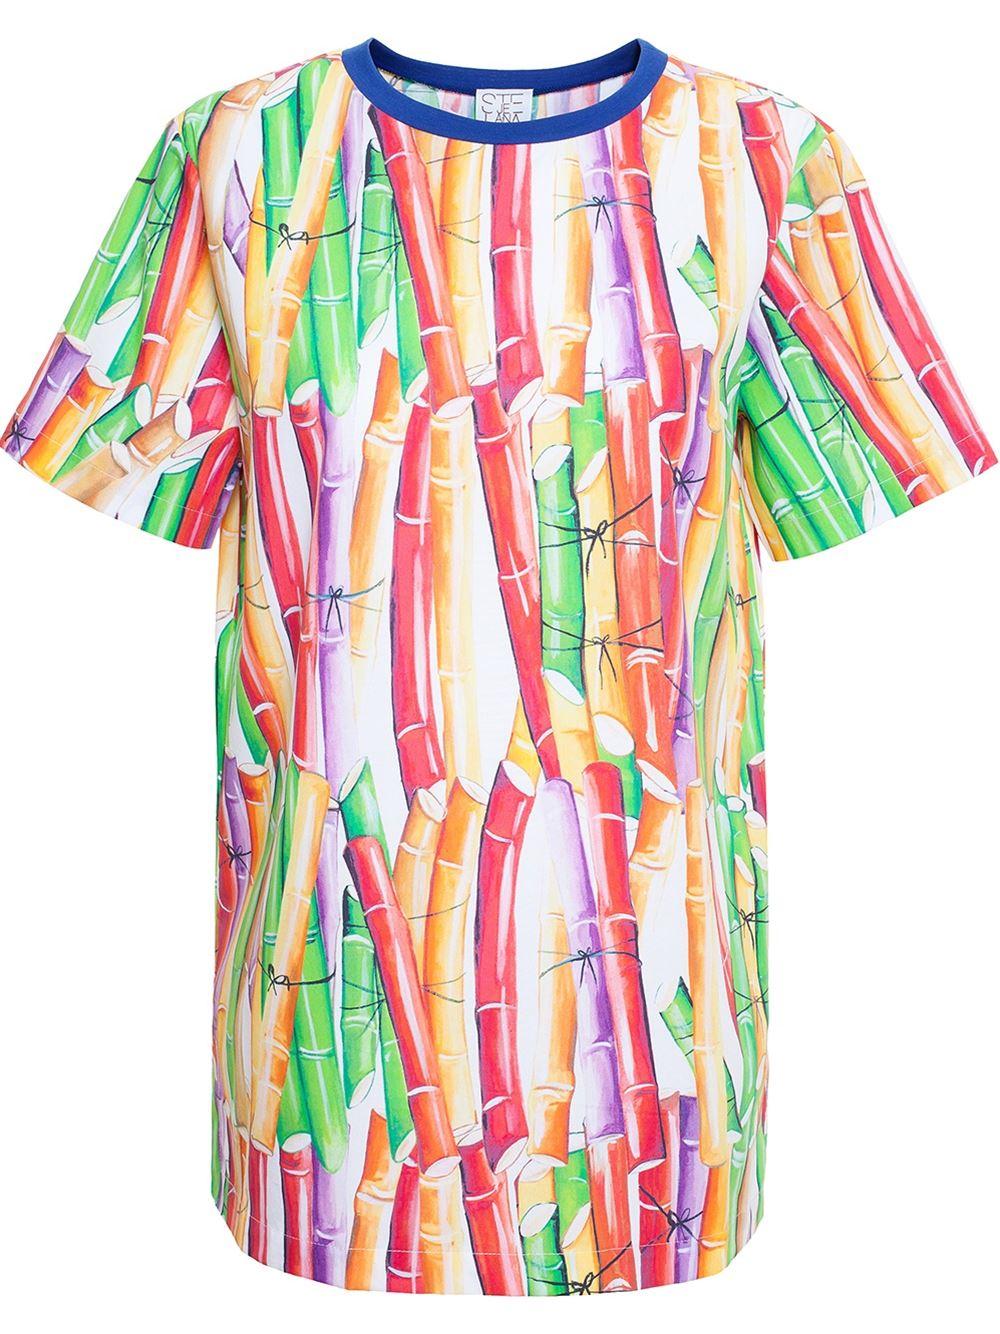 Stella jean bamboo print top